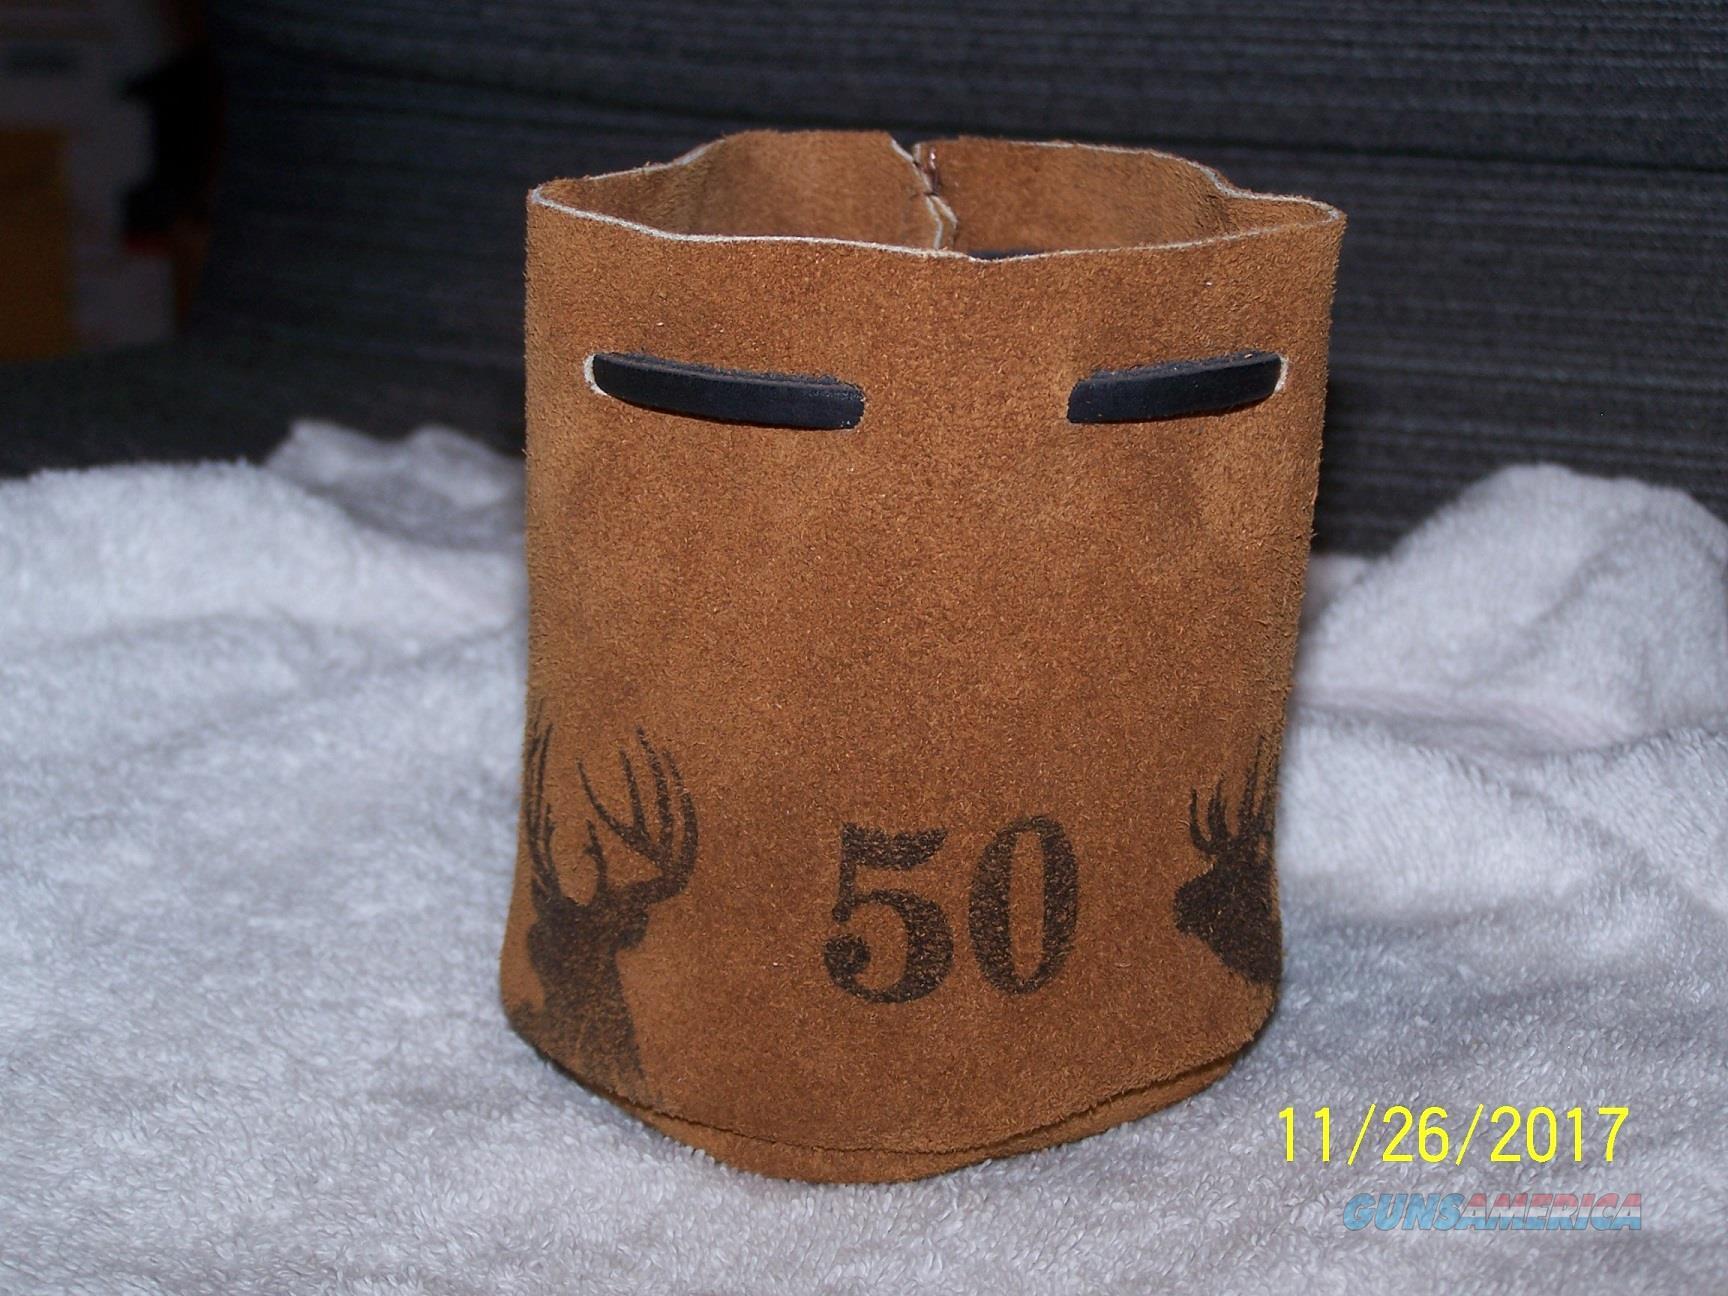 50 cal muzzleloader Leather bag with 40 RB bullets  Non-Guns > Black Powder Cartridge